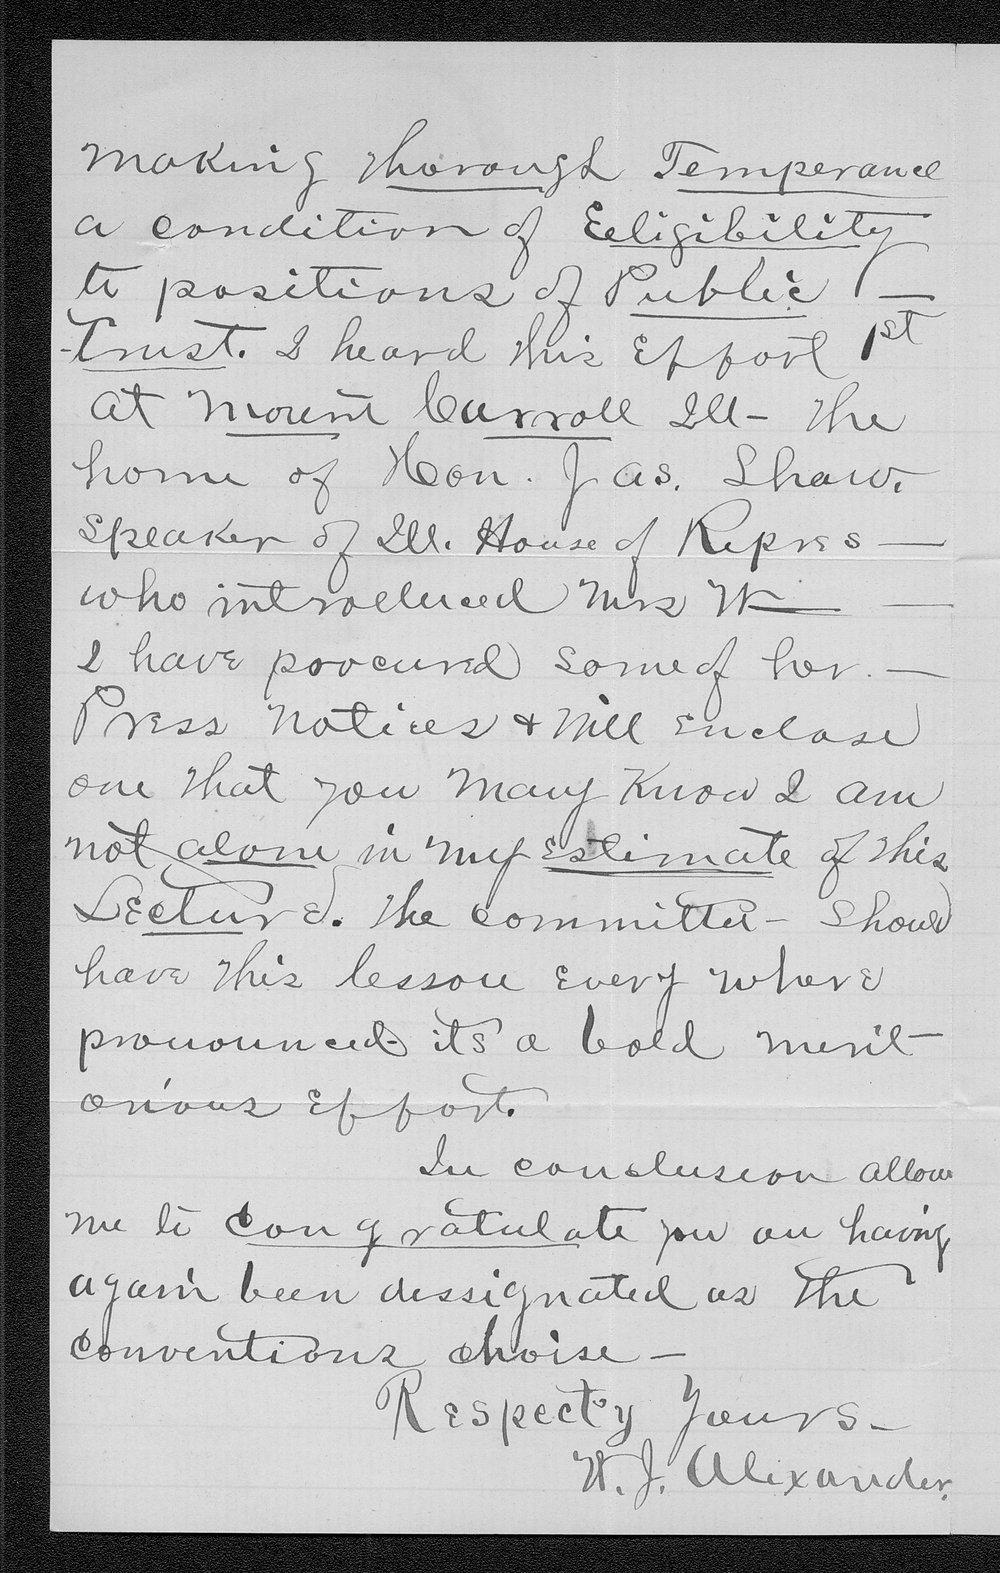 W. J. Alexander to Governor John St. John - 2